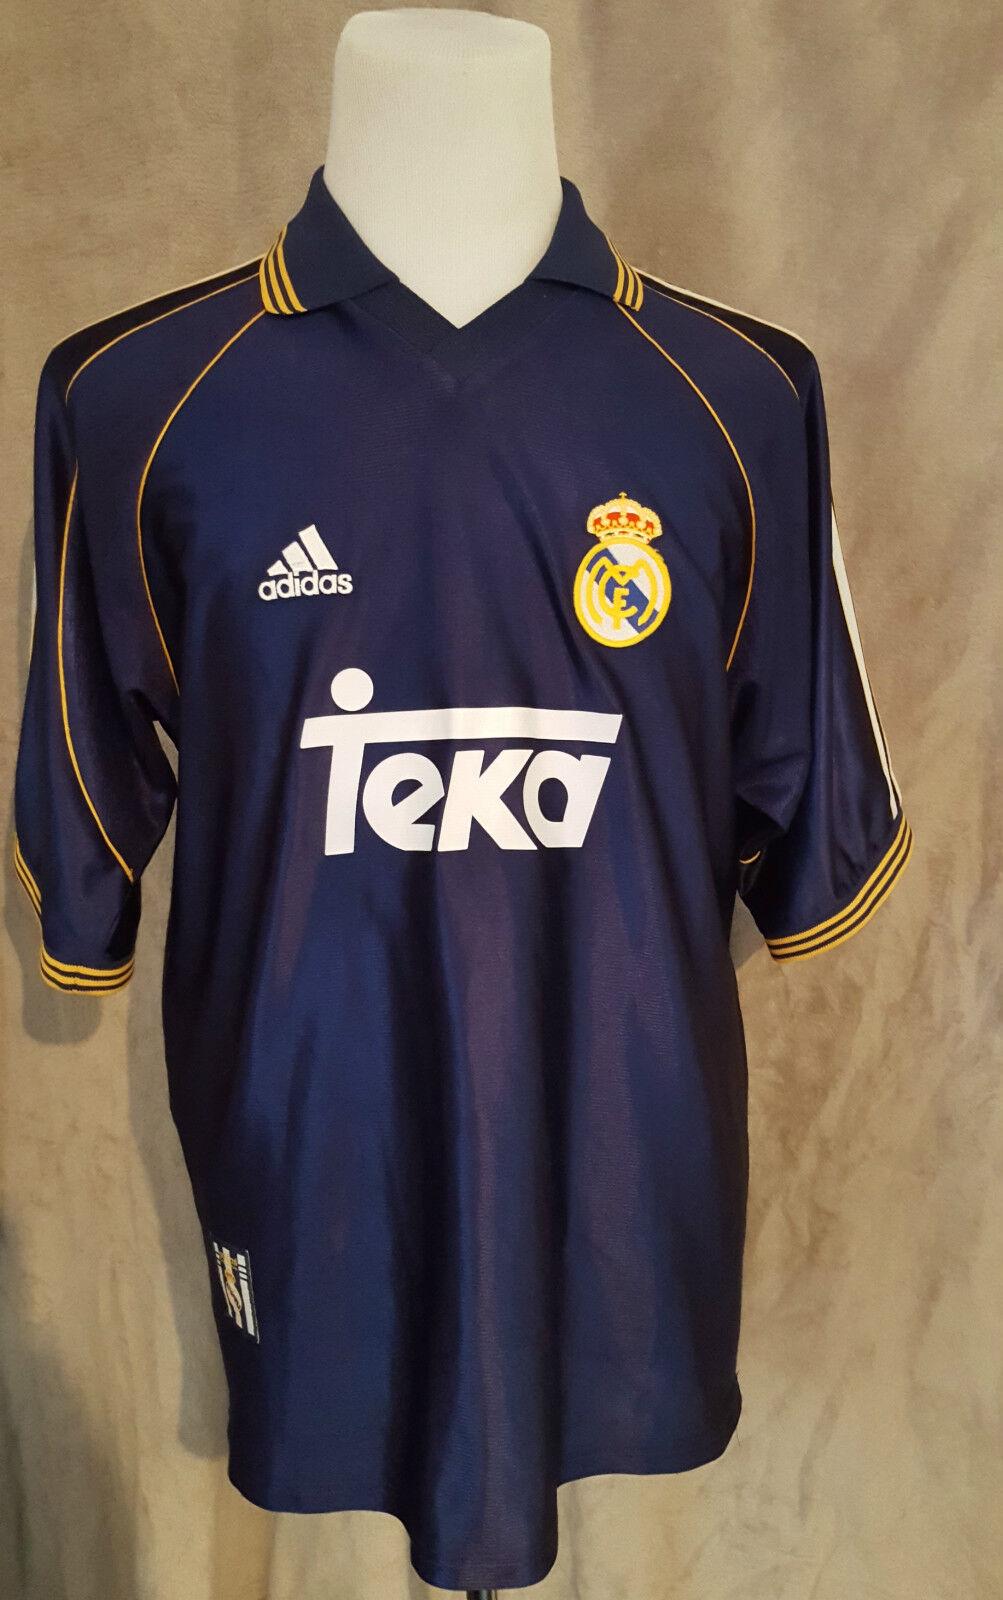 Molto RARO VINTAGE REAL MADRID ADIDAS Away Camicia TAGLIA  Large Ottime condizioni